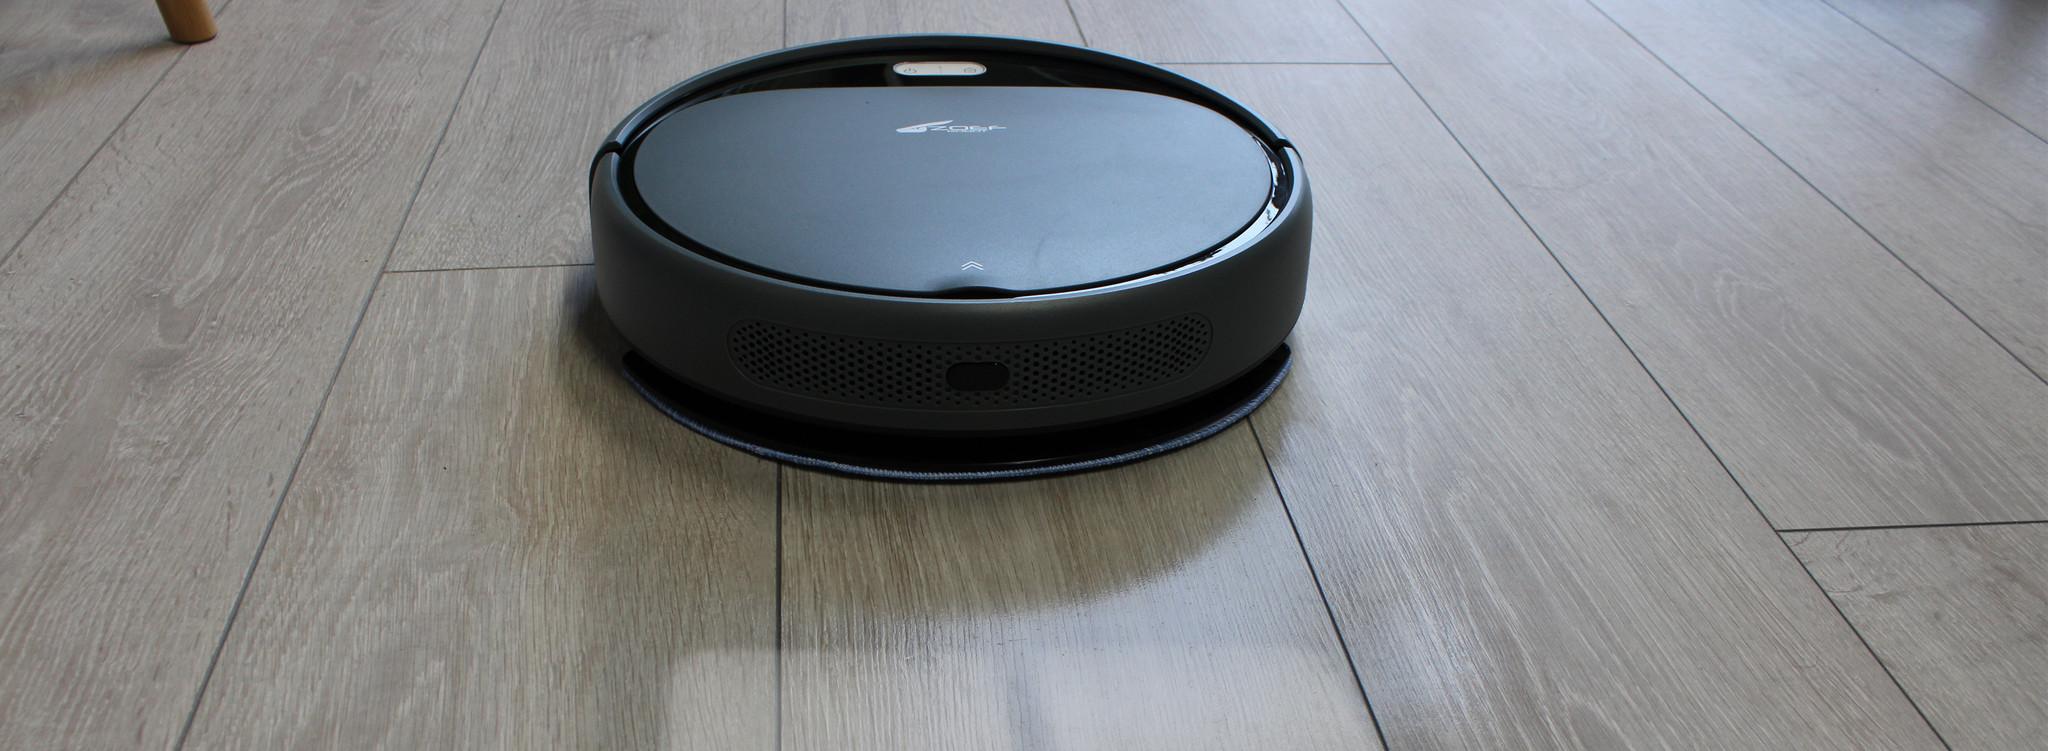 robotstofzuiger-bep-dweilfunctie